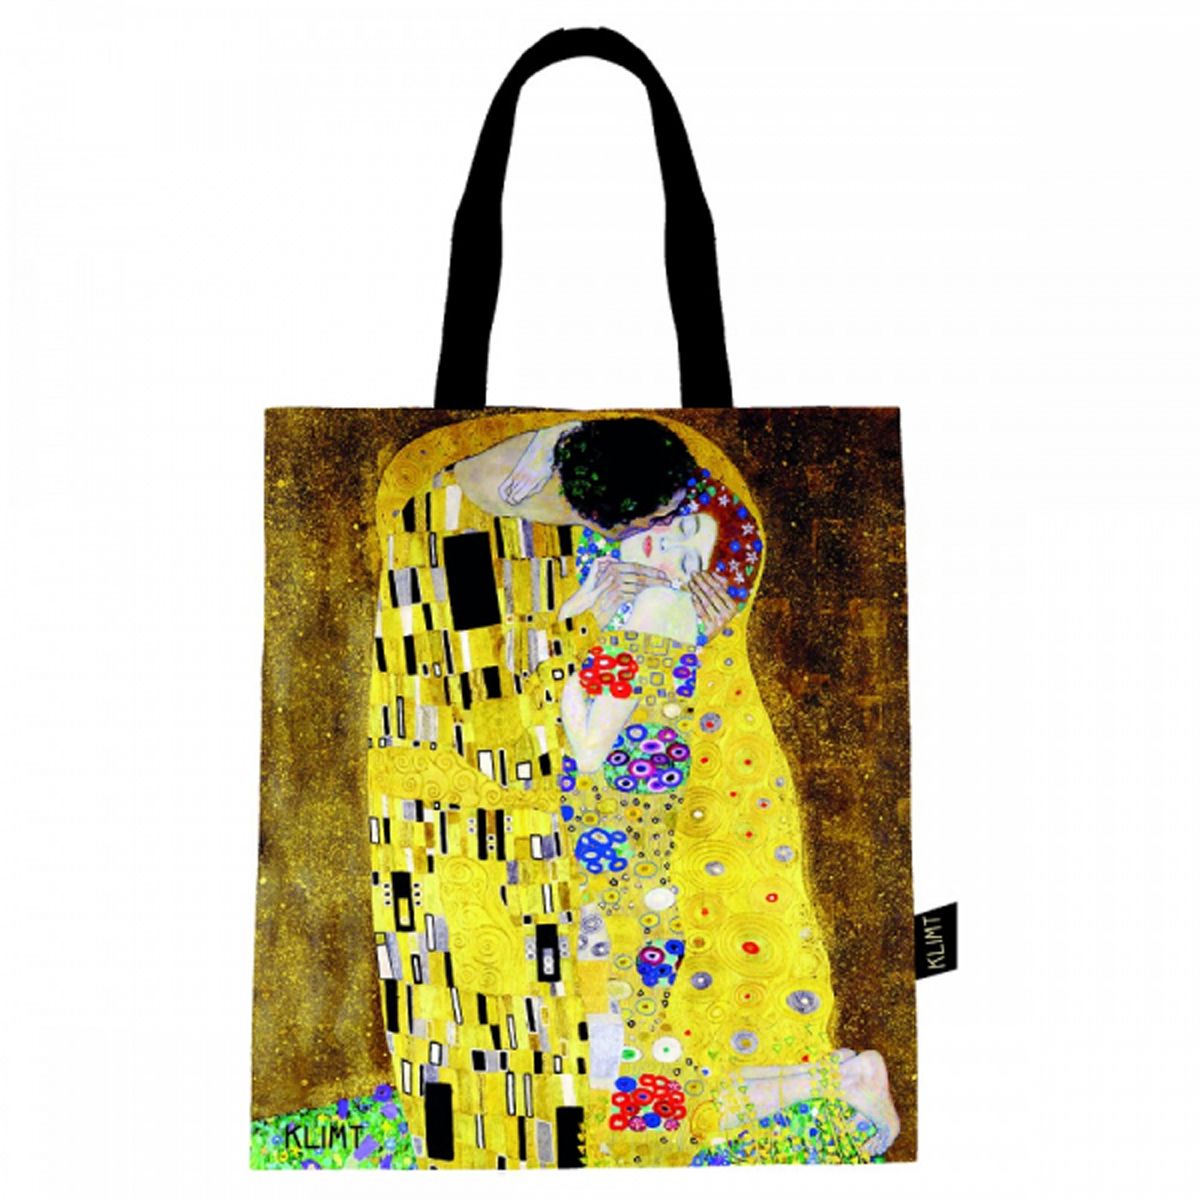 Sac coton / tote bag \'Gustav Klimt\' (le Baiser) - 44x38 cm - [R1996]